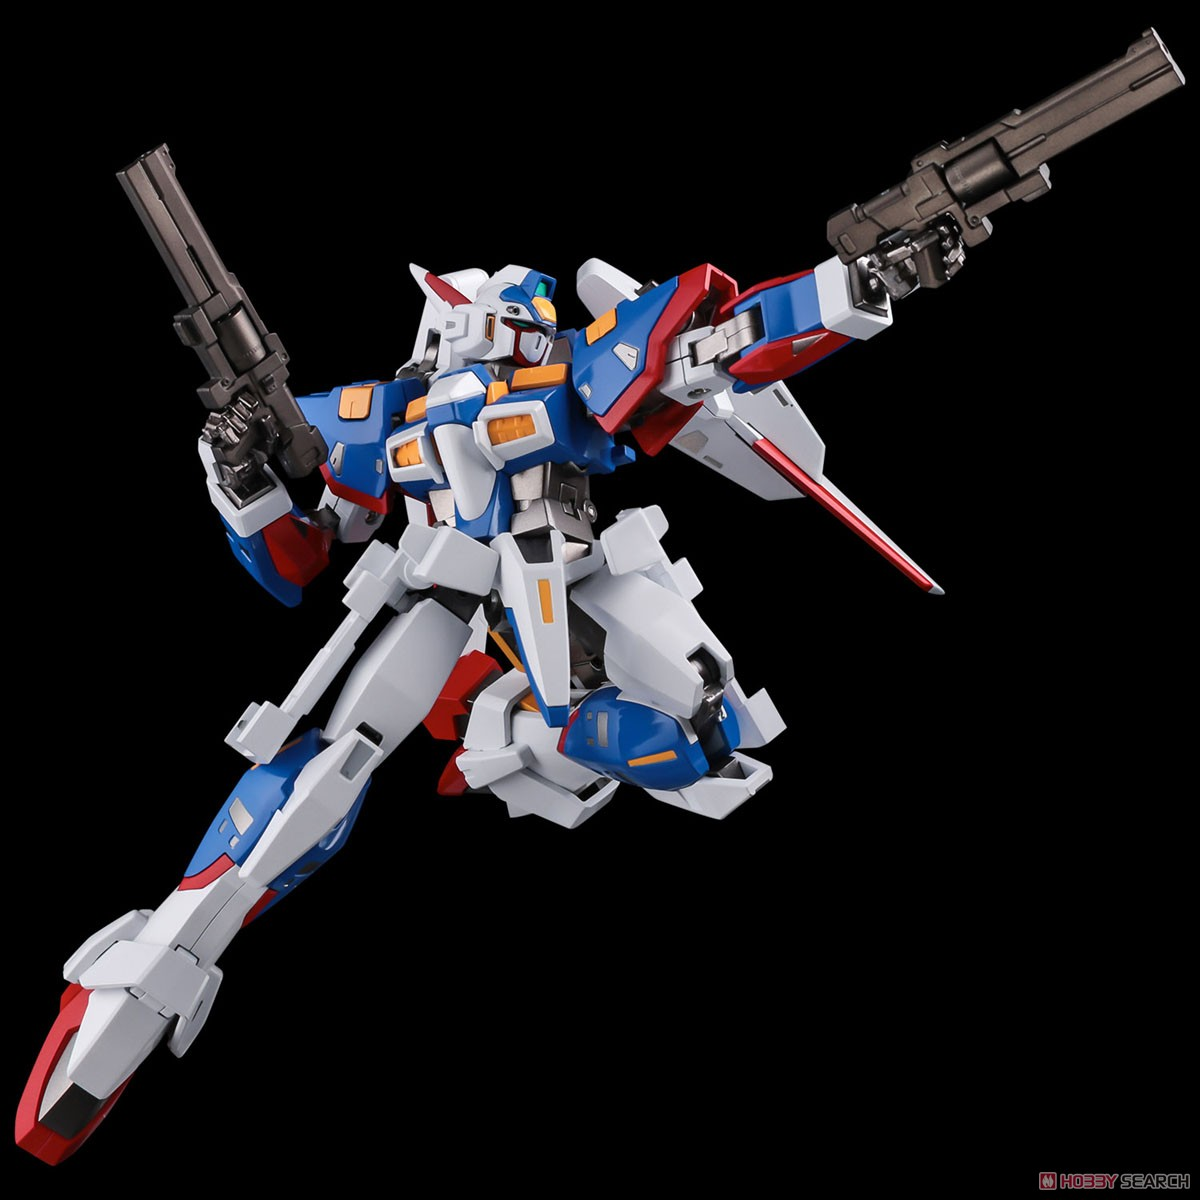 RIOBOT『変形合体 R-1』スーパーロボット大戦OG 可変合体フィギュア-007